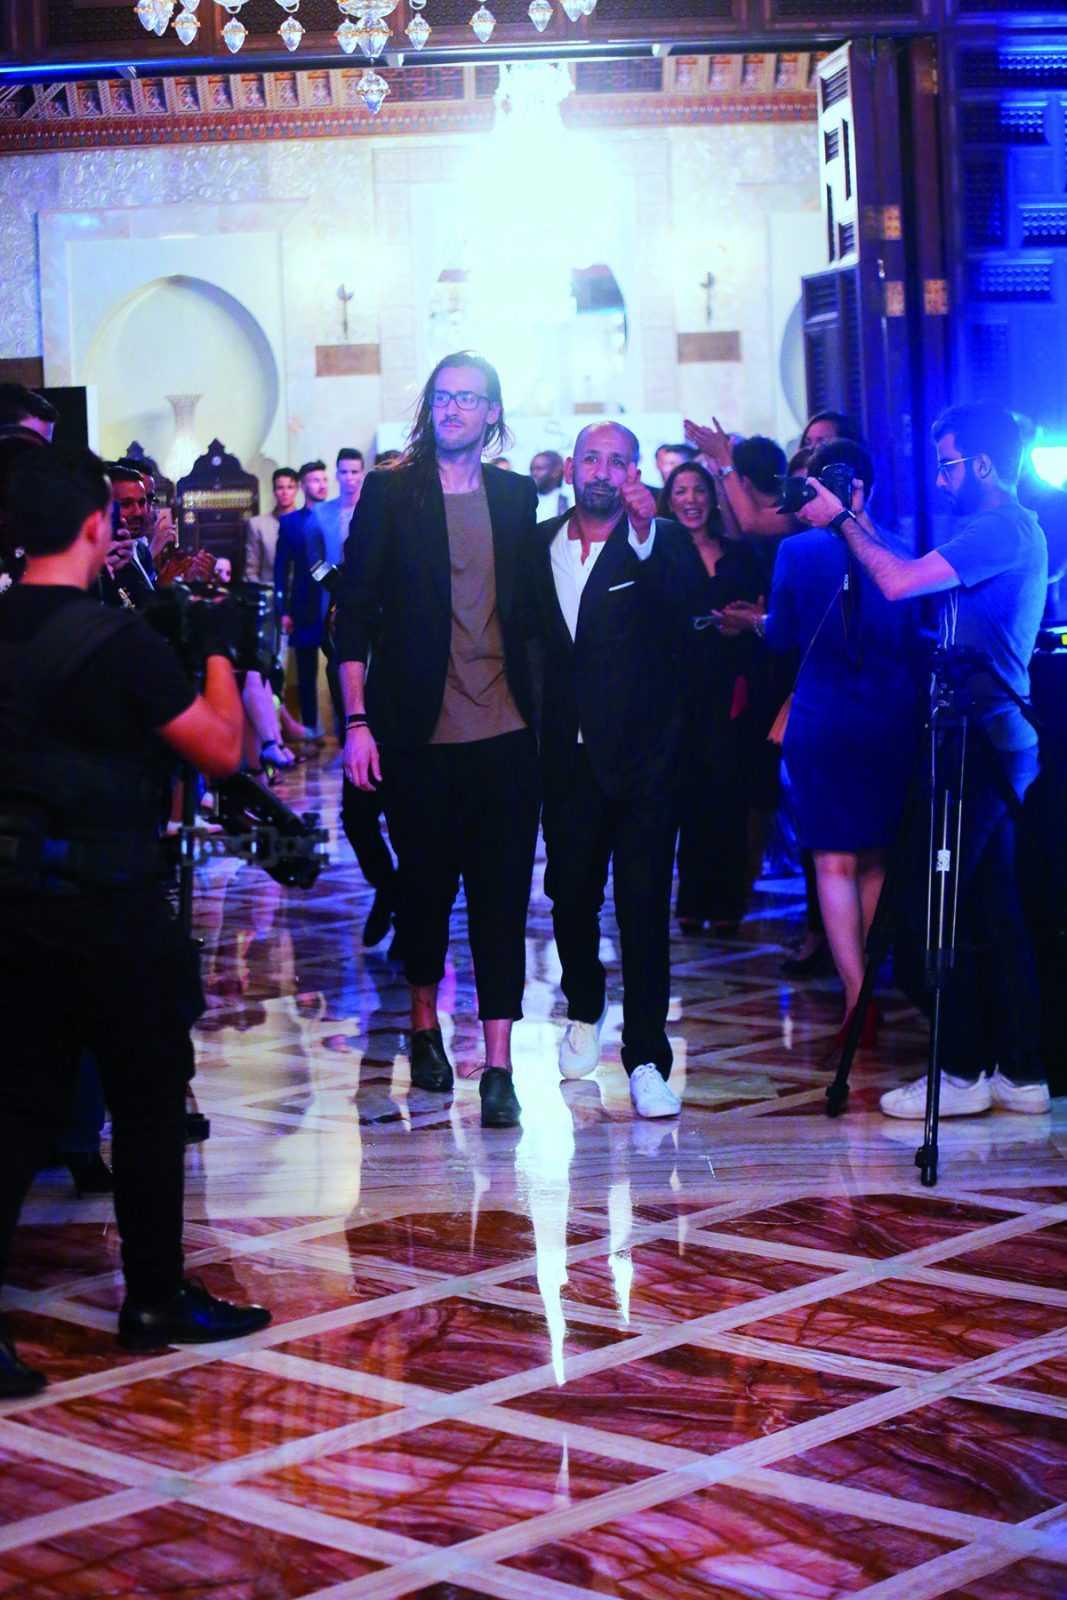 Le Gentlemen style selon Sidi Marrakech Tailoring